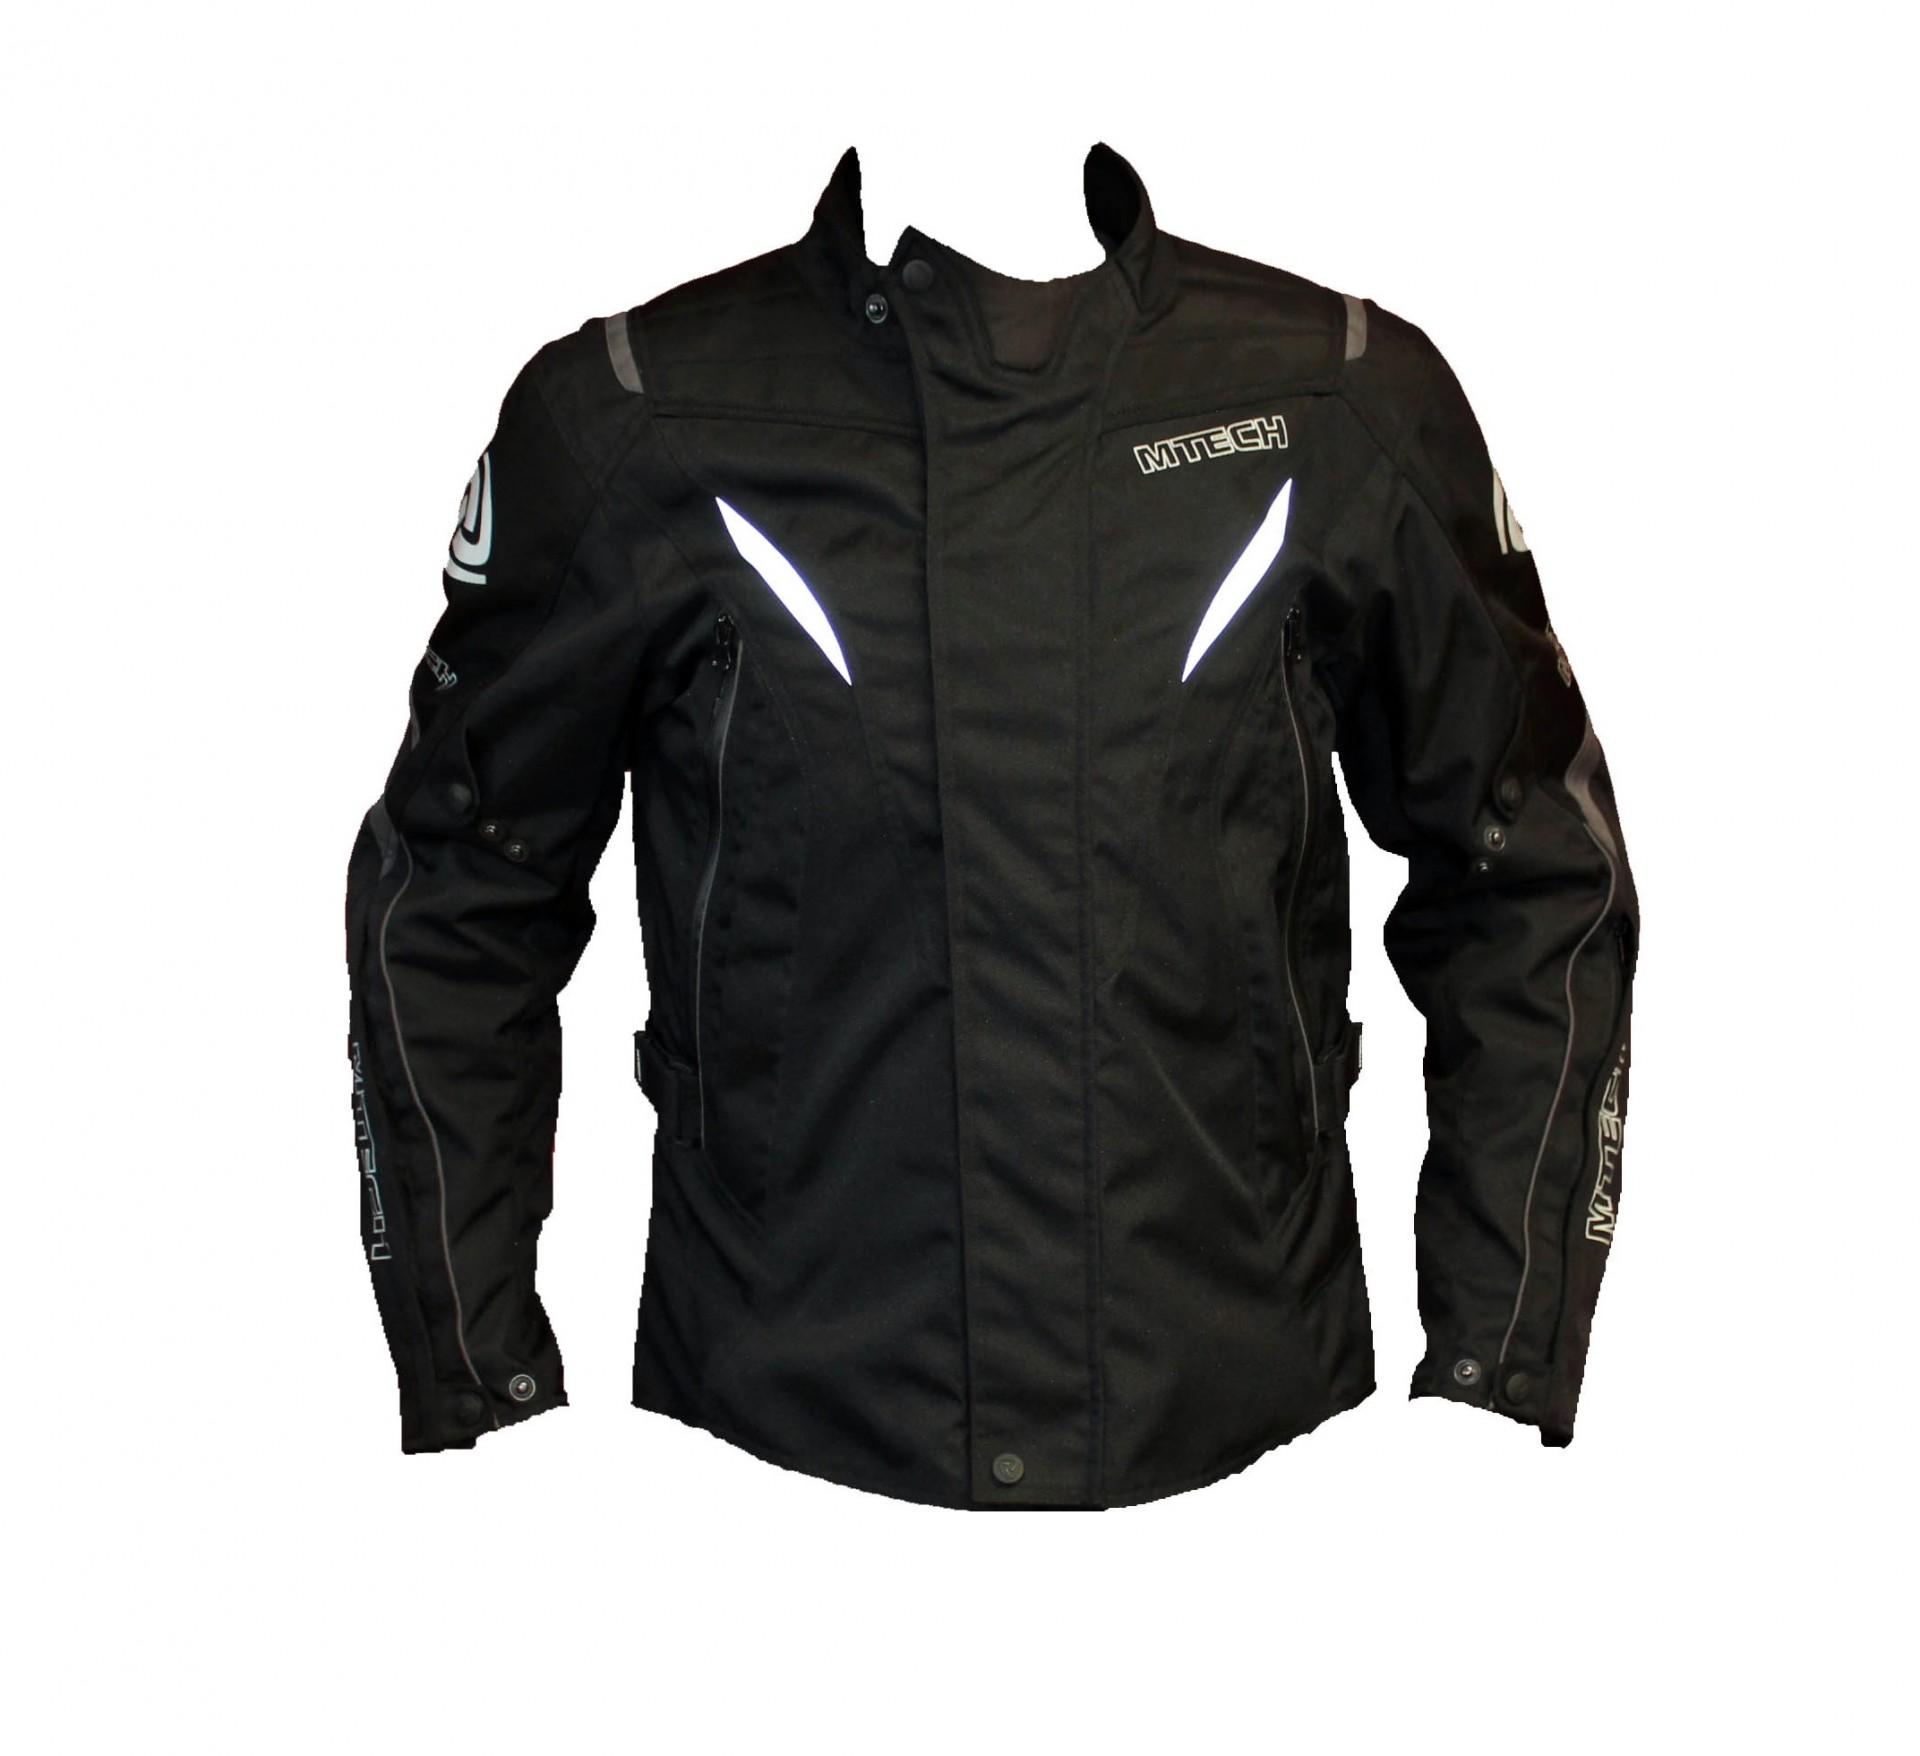 Blusão Mtech Express Black